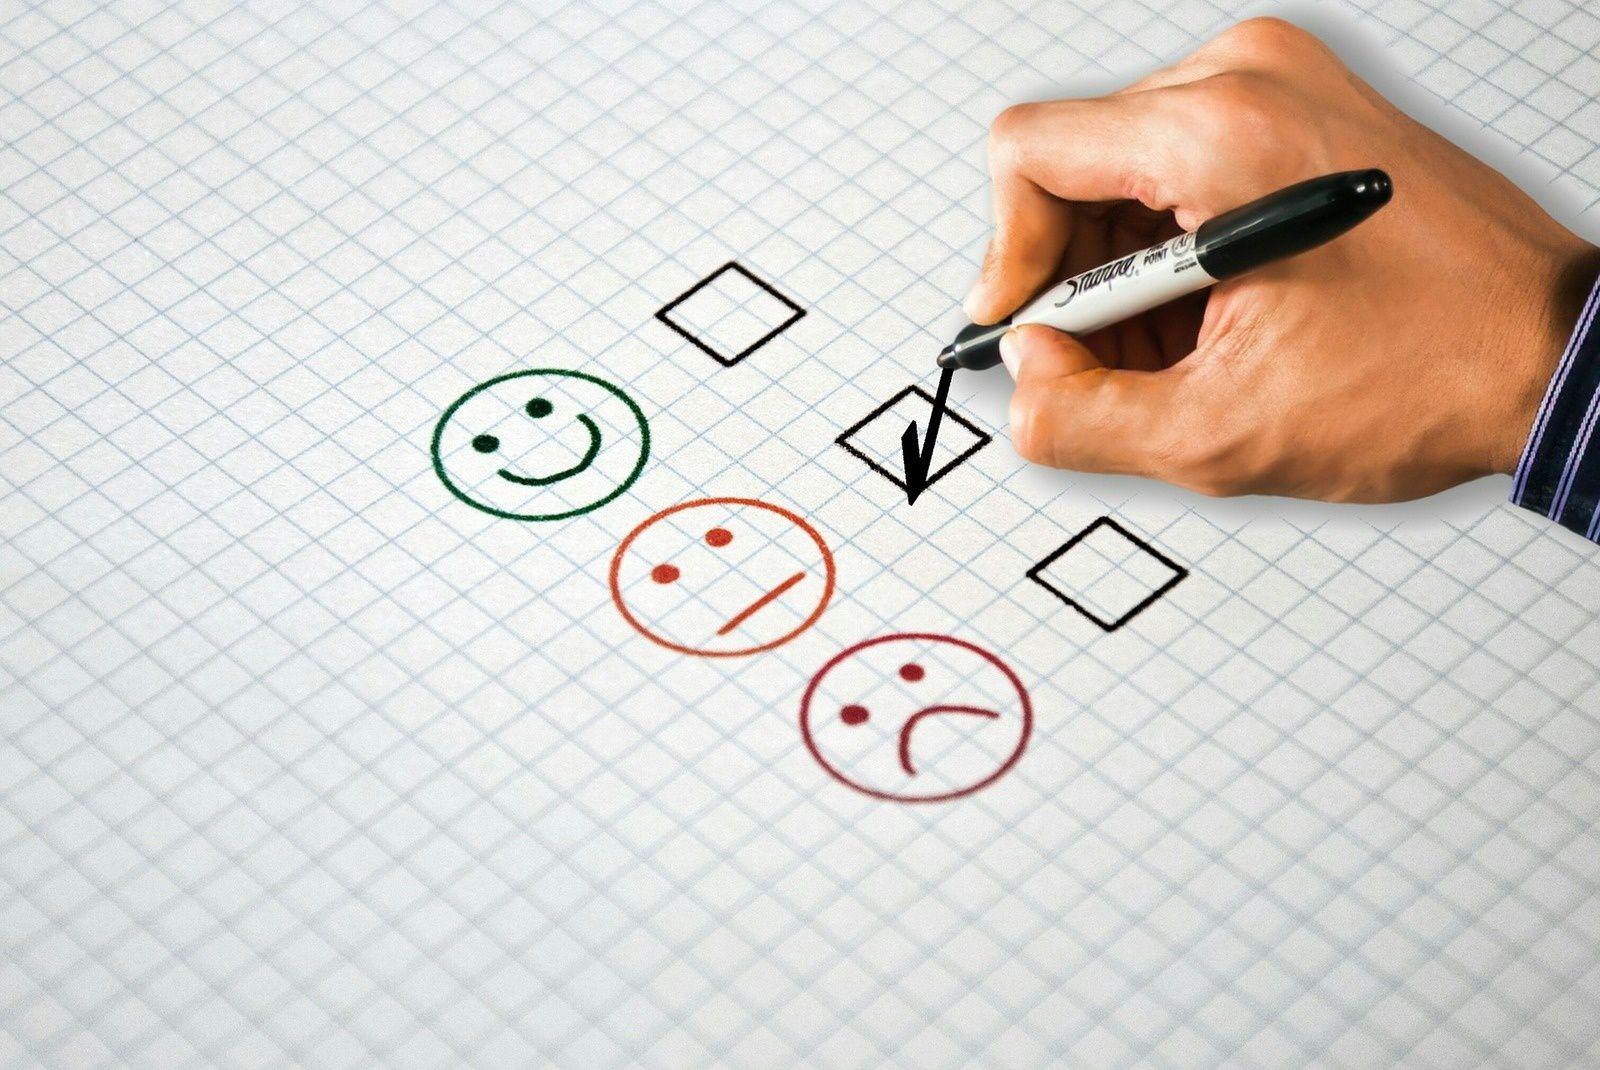 ... Trnd: mon expérience de testeuse et mon avis